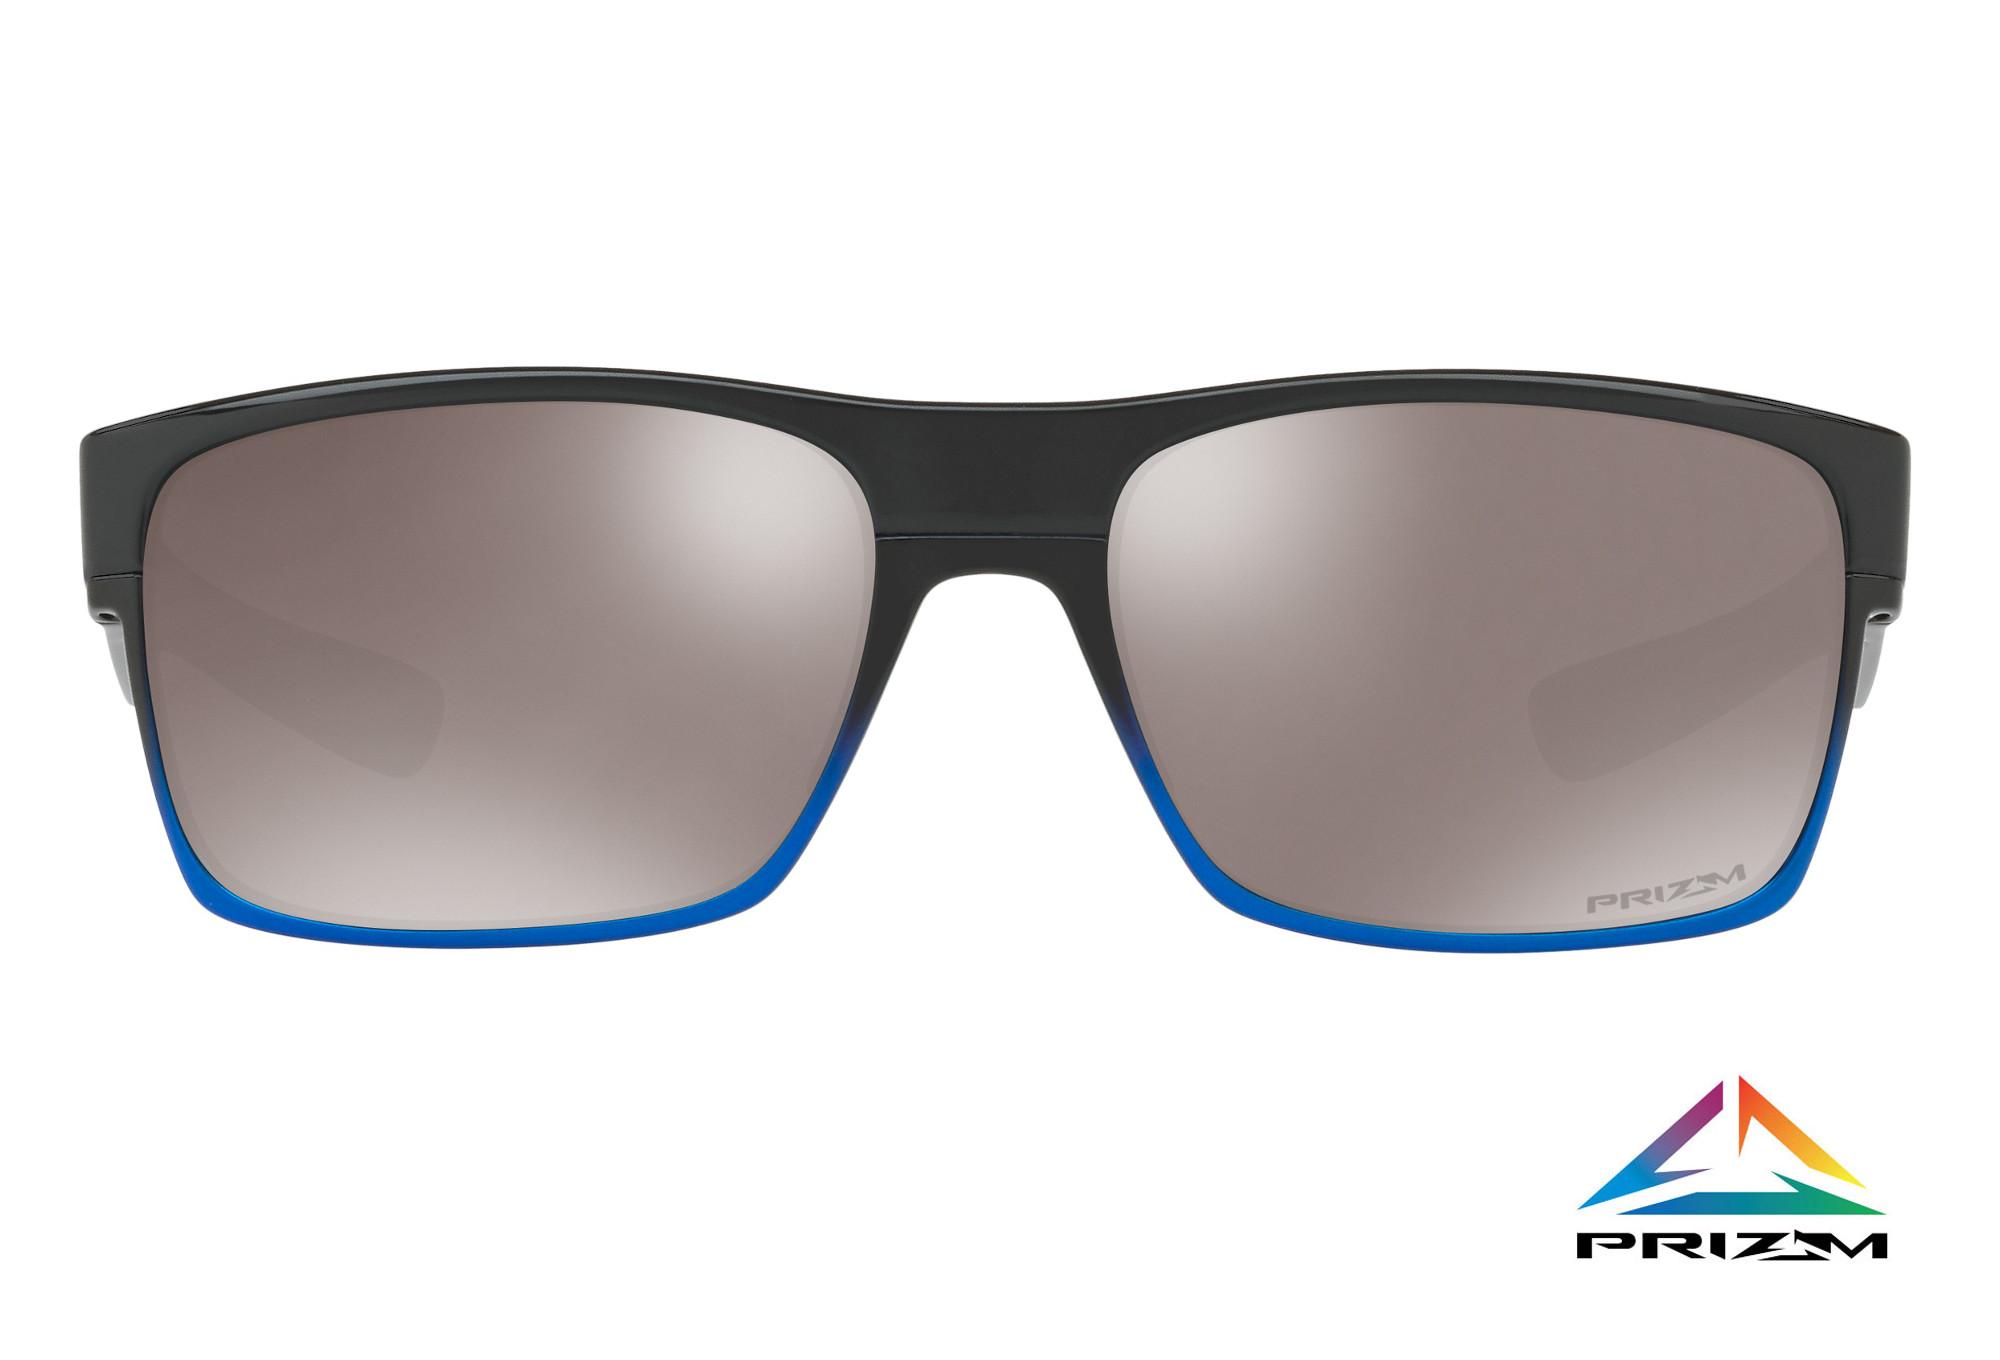 boutique outlet come comprare nuove foto OAKLEY Sunglasses Two Face Neon Pop Blue Pop Fade W/ Prizm Black ...